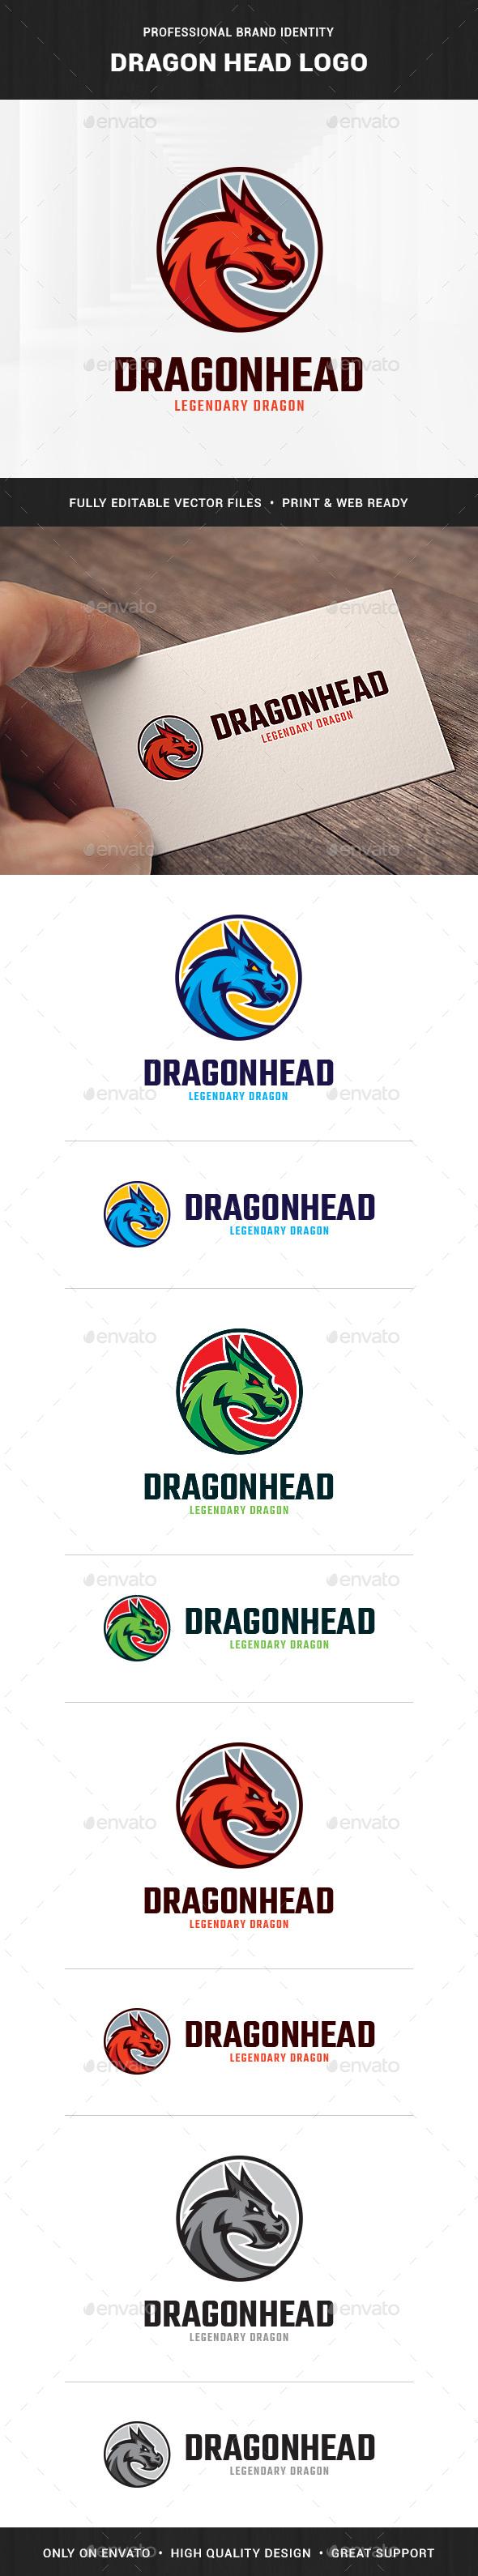 Dragon Head Logo Template - Animals Logo Templates